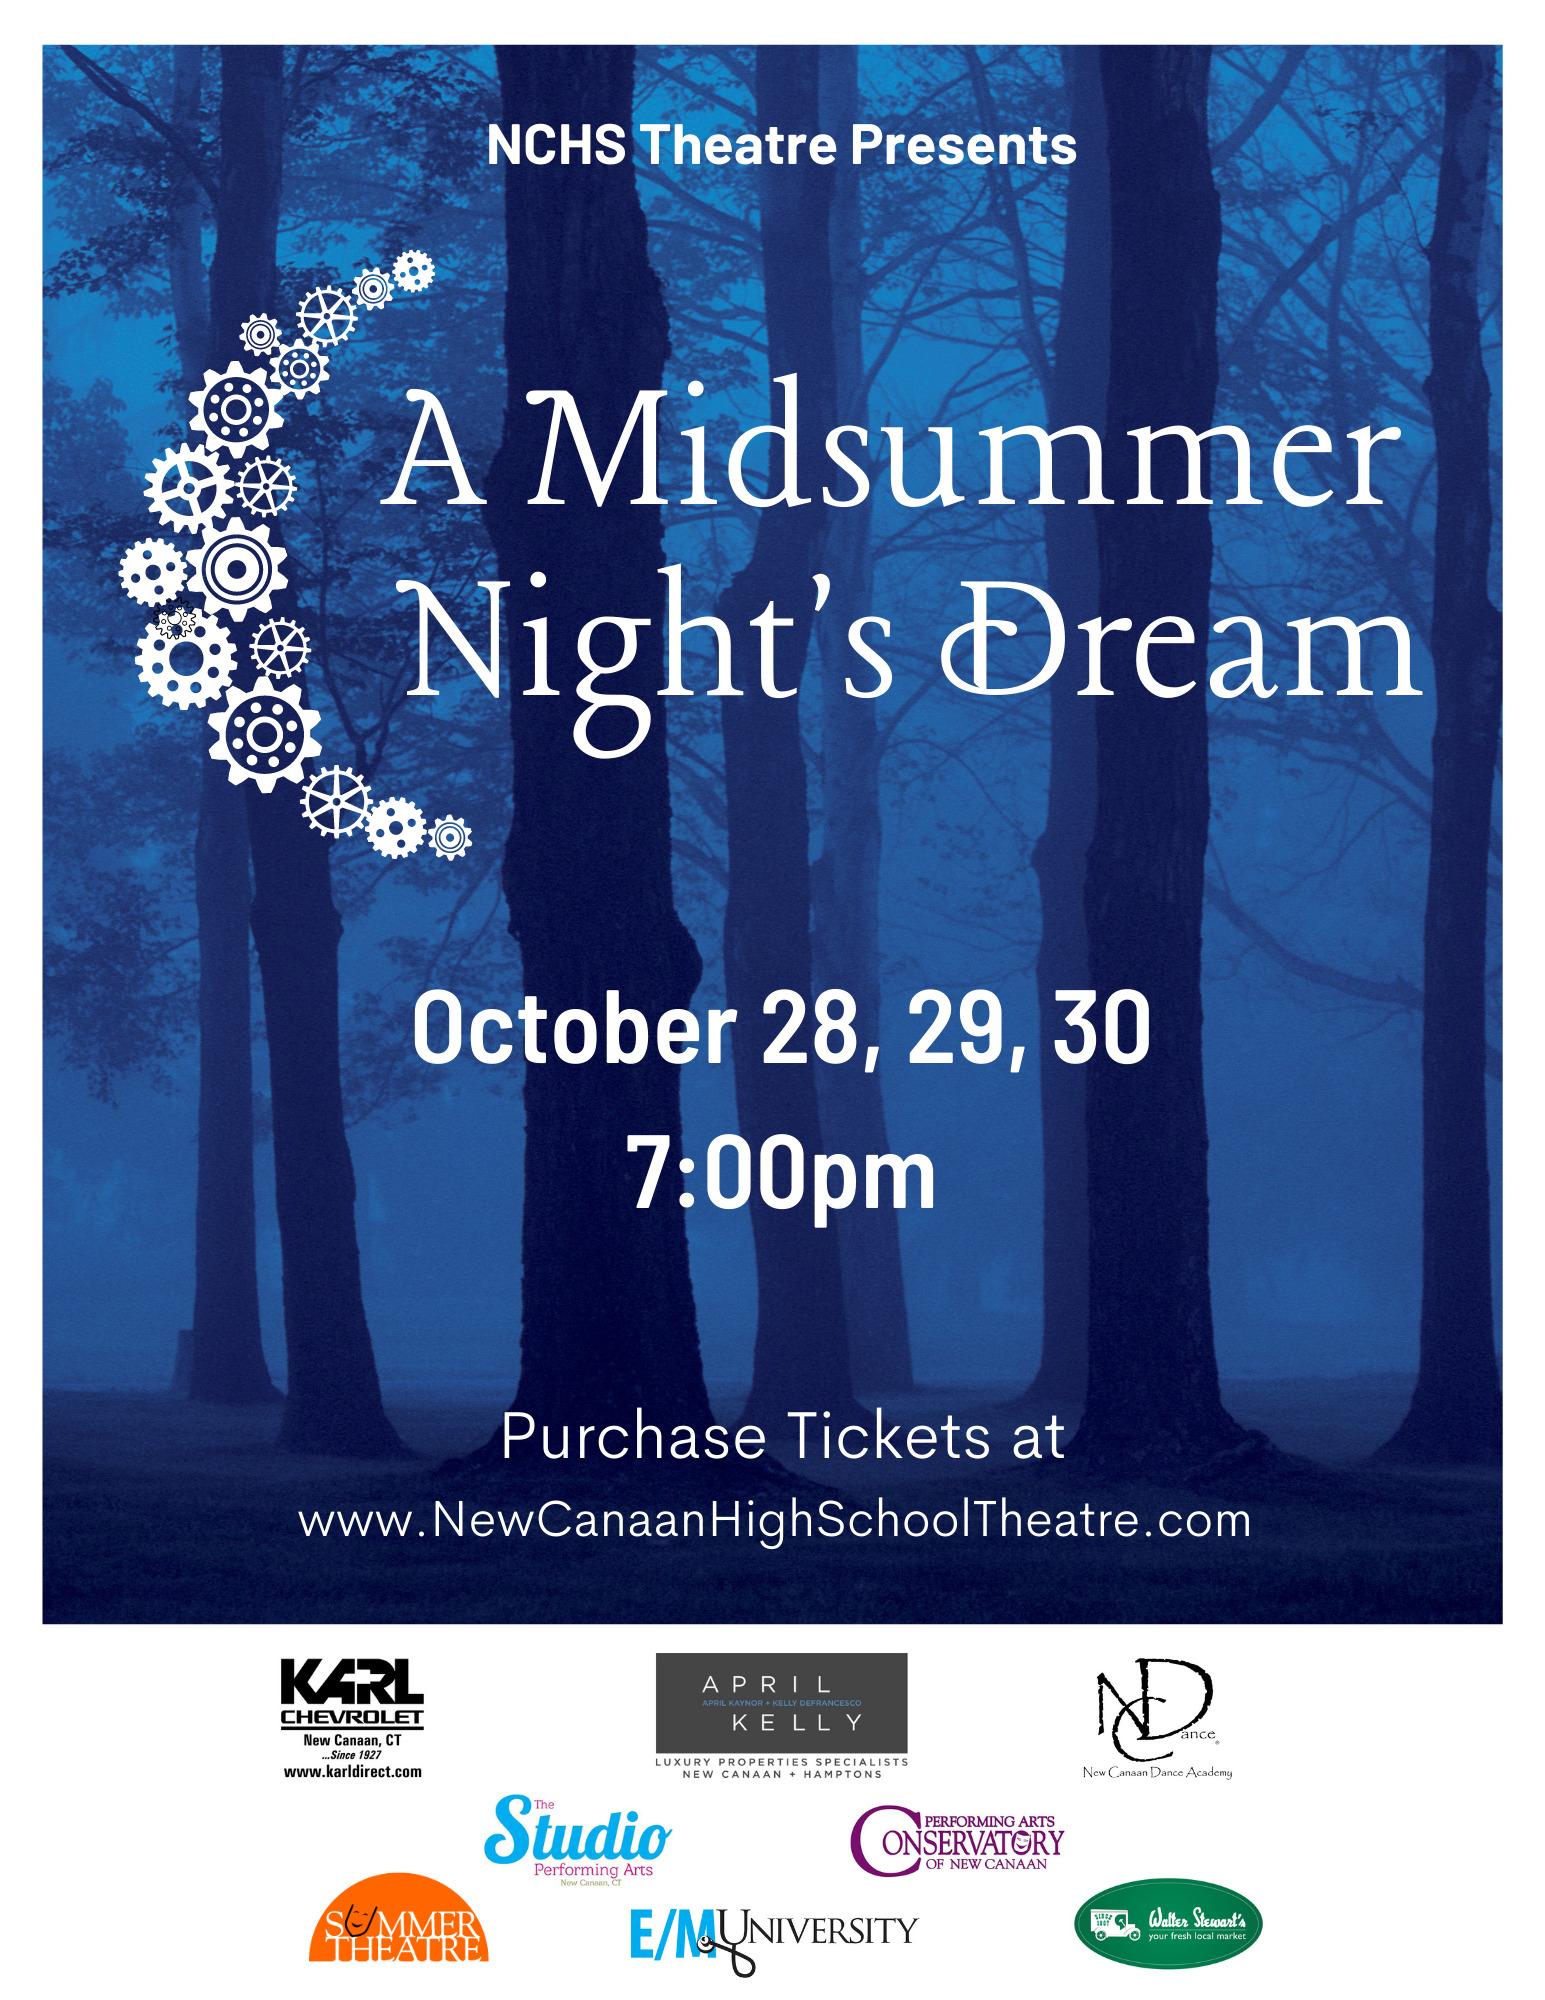 final a midsummer nights dream flyer 8.5 x 11 in 6osoc2.tmp